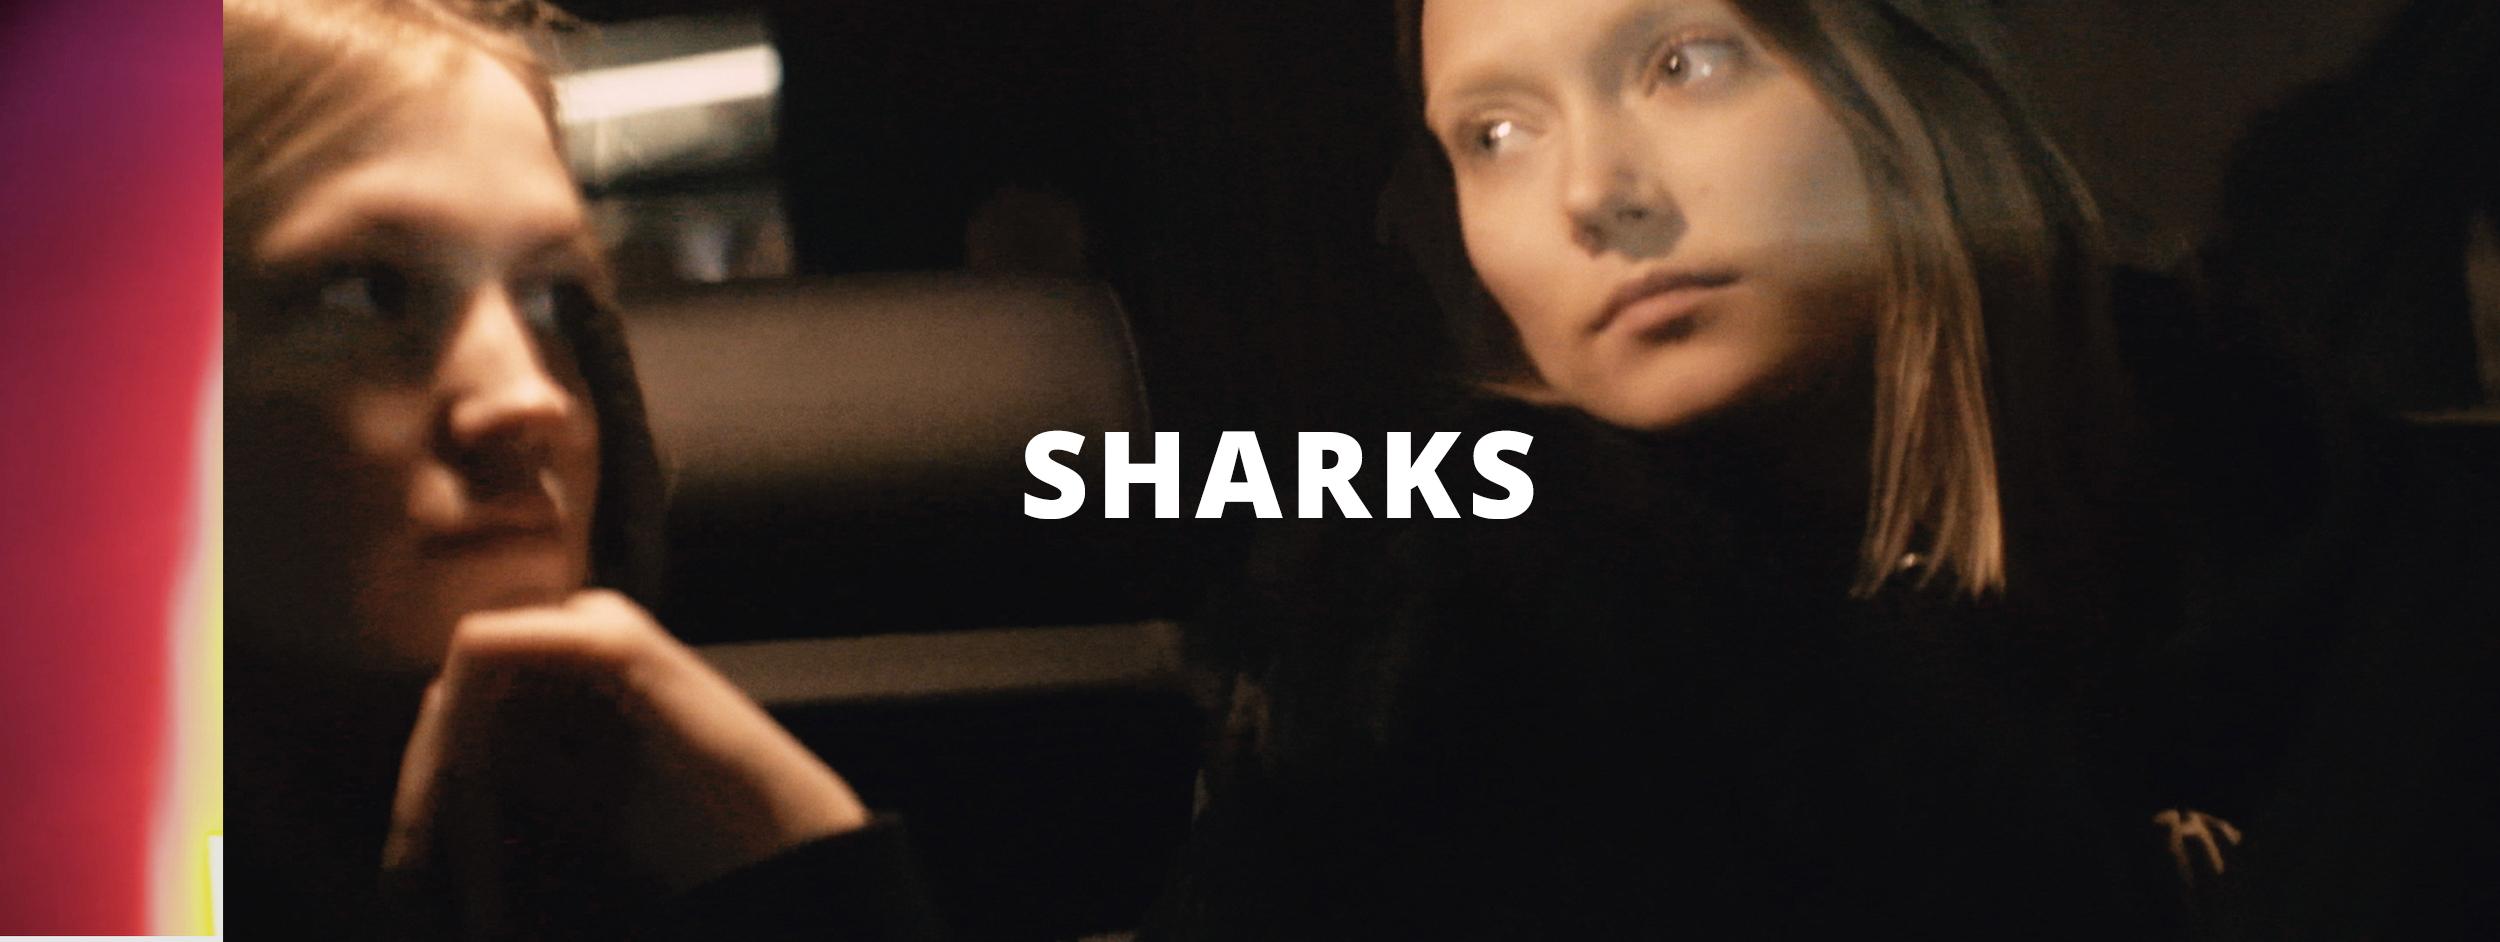 sharks+screen.jpg